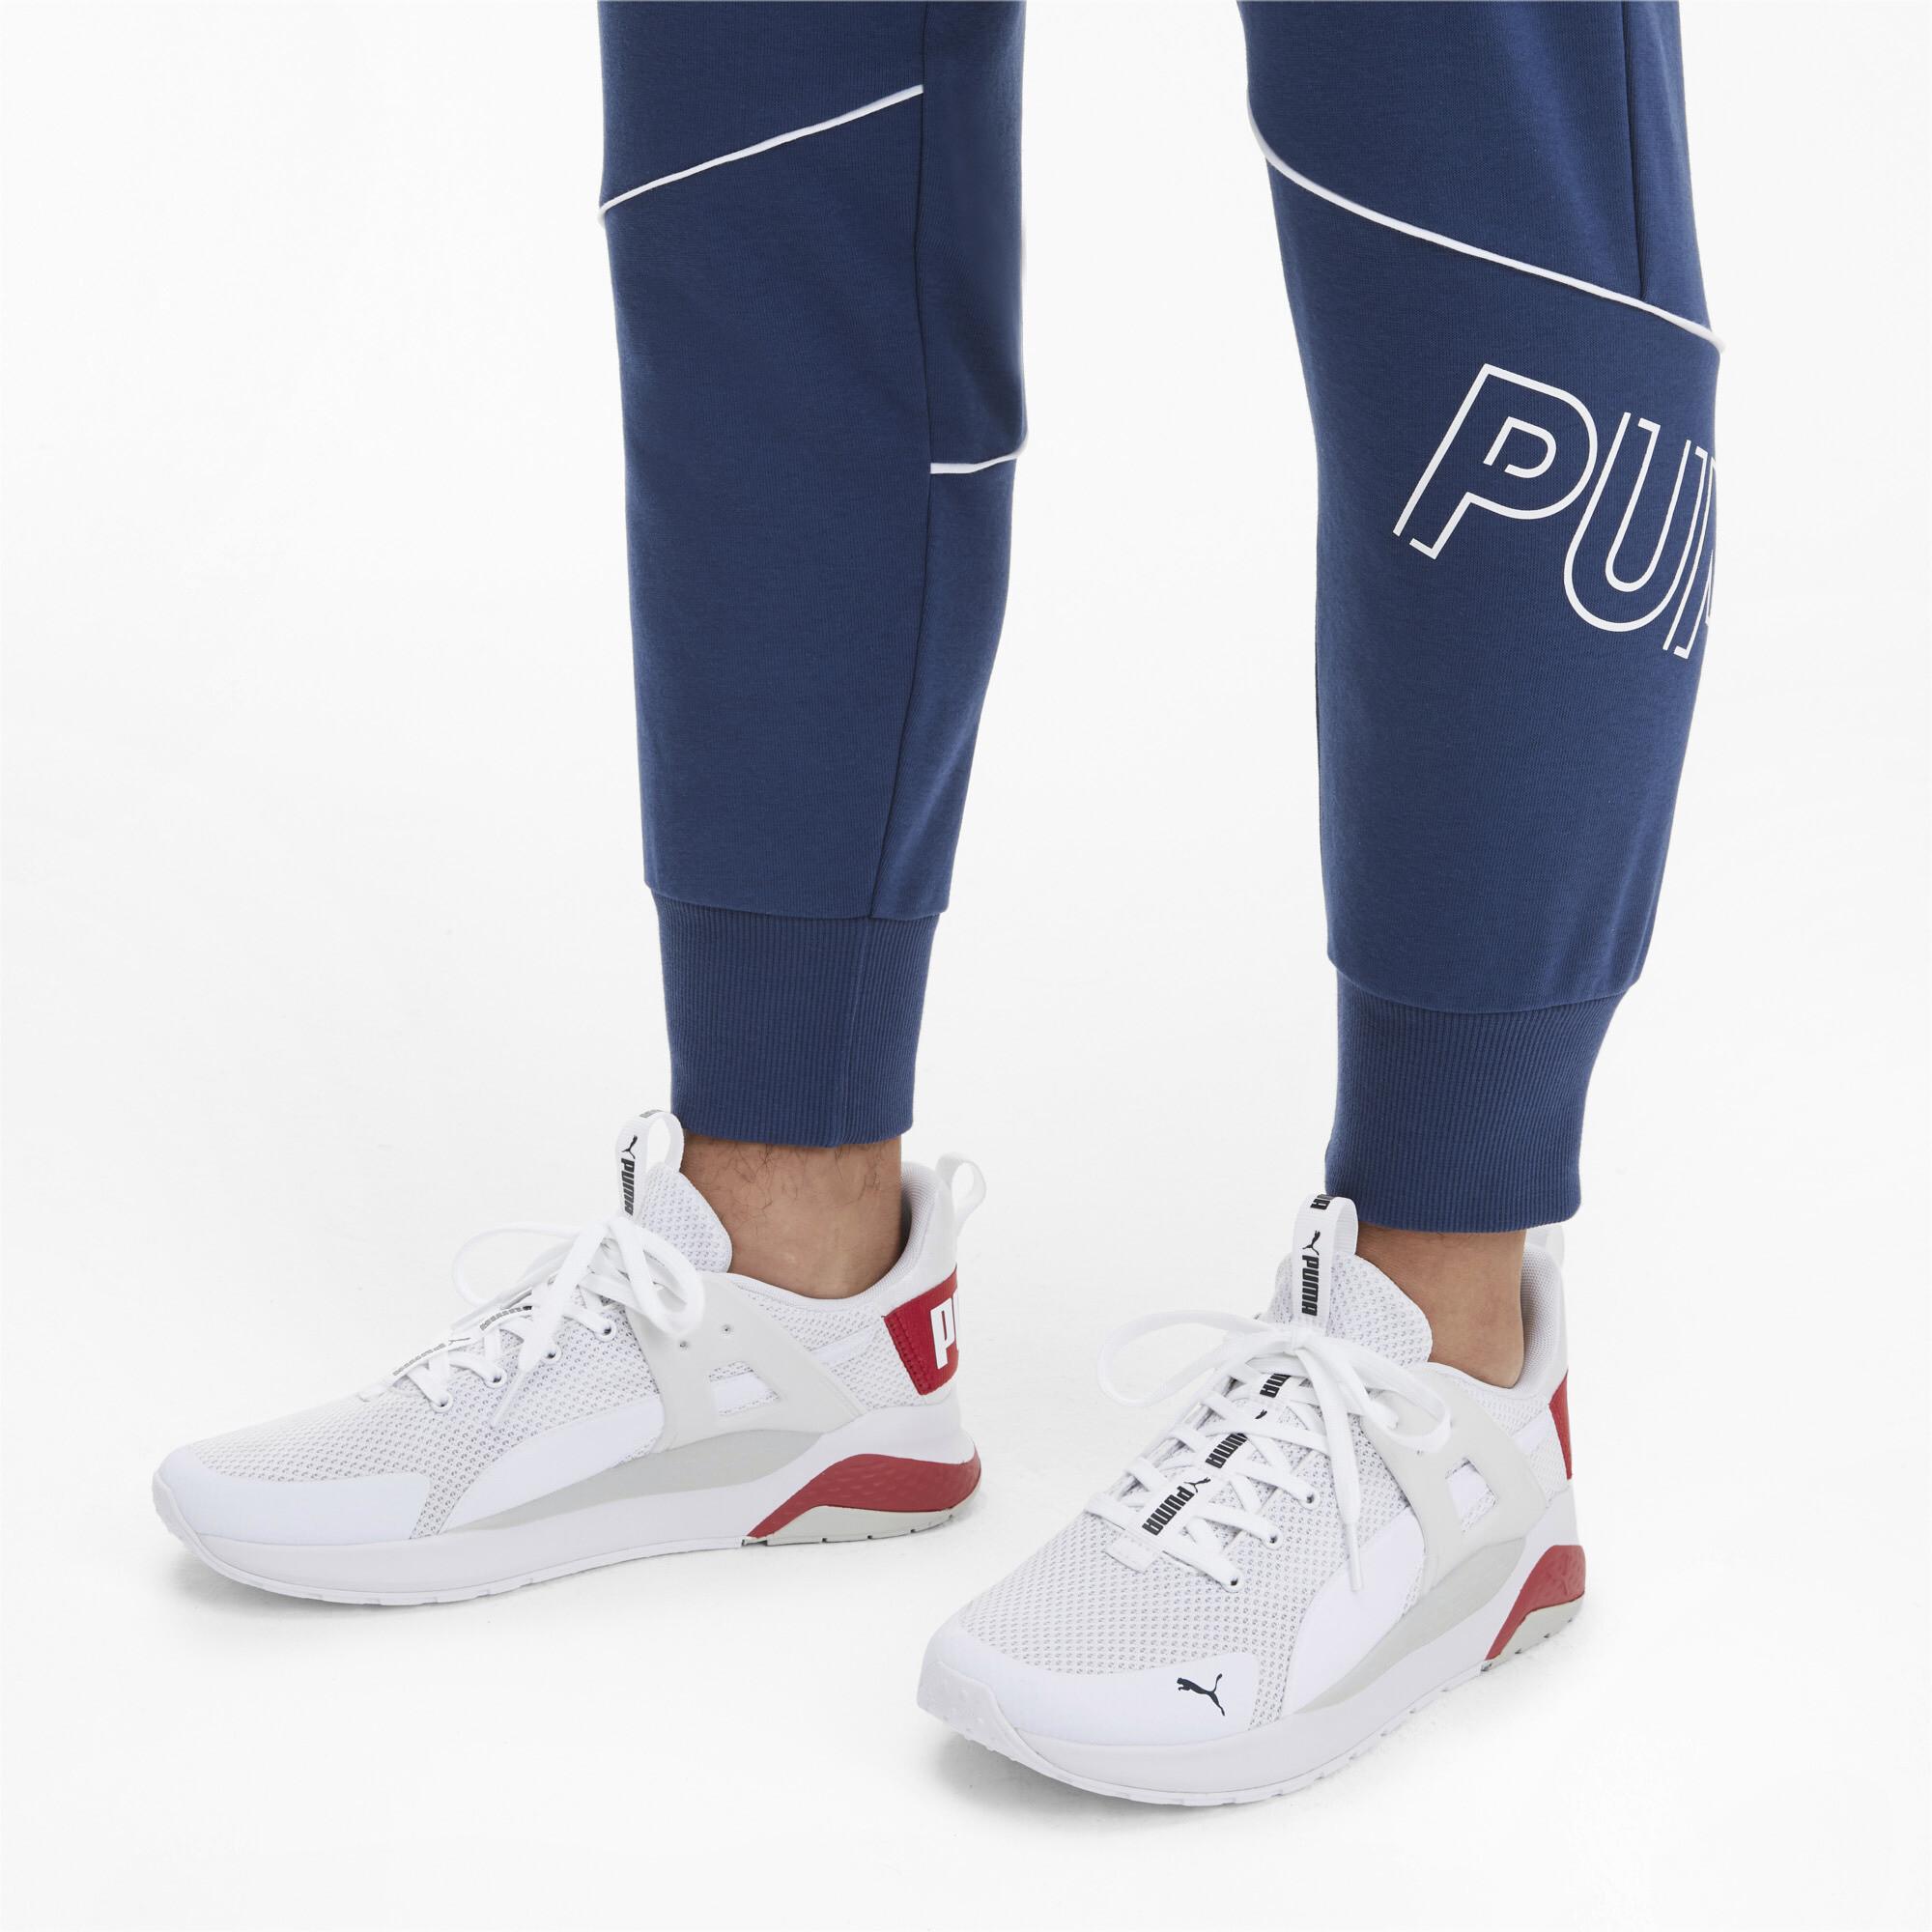 thumbnail 18 - PUMA-Men-039-s-Anzarun-Cage-Sneakers